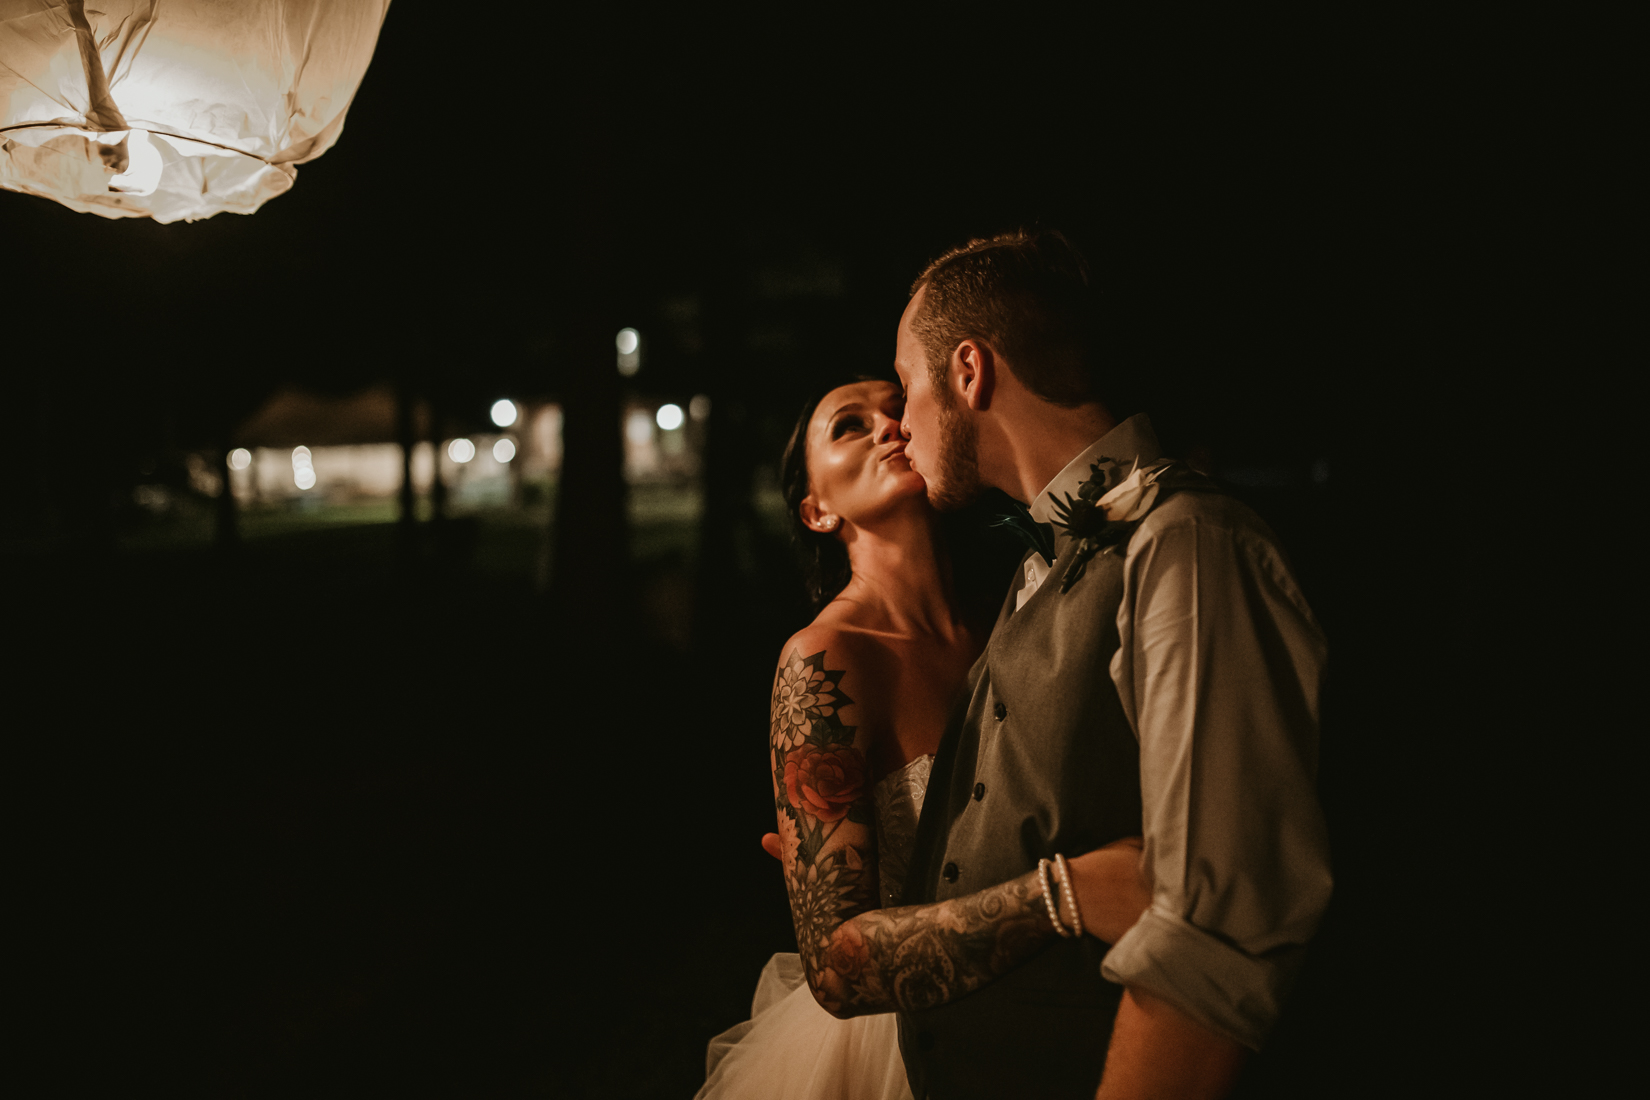 olivia_zay_wedding_09_2018-9235.jpg